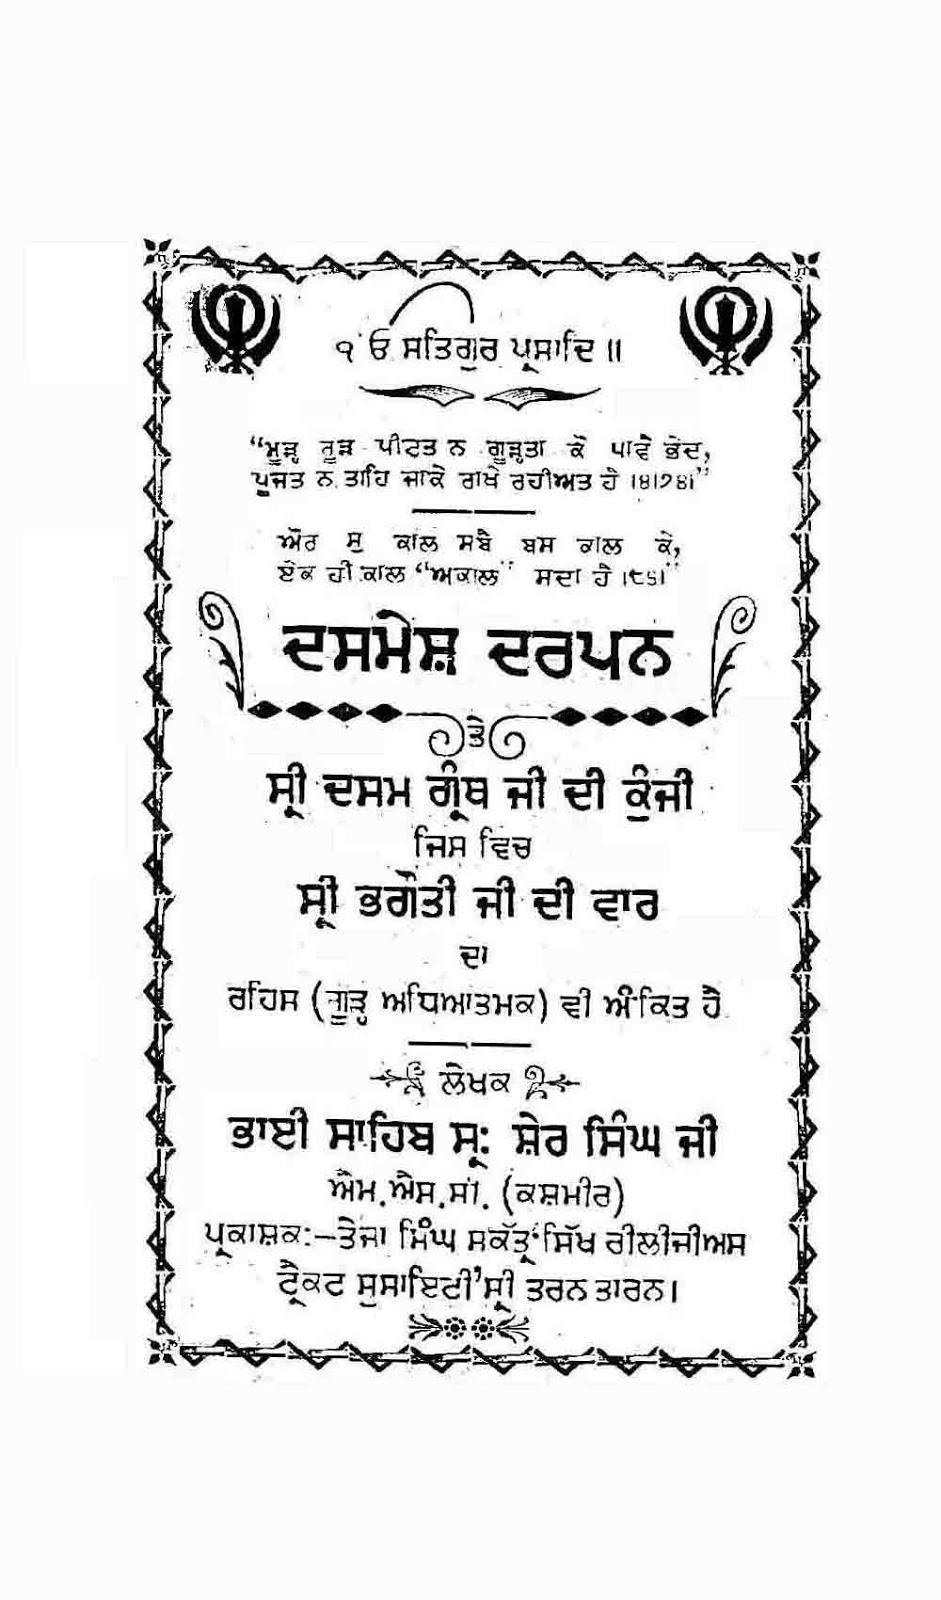 Download Taksaali Pothi Gurbani Paath Darpan - GURBANI